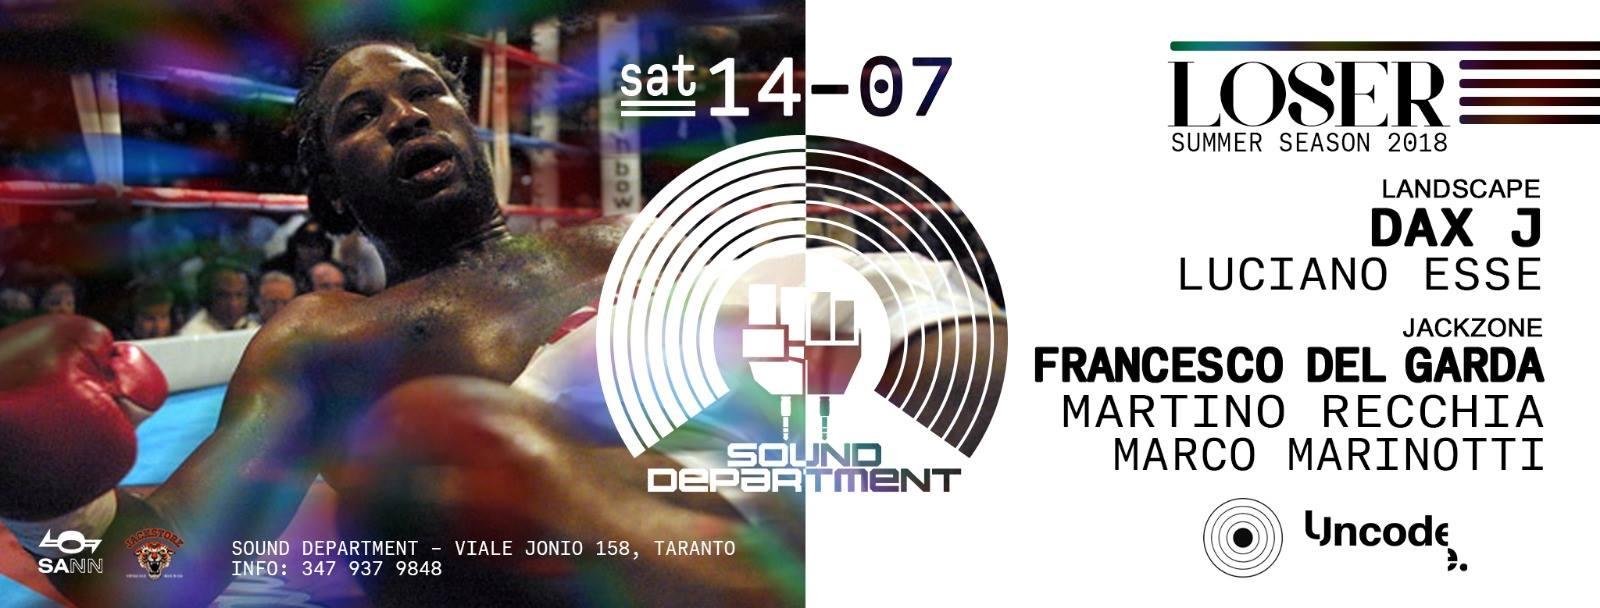 Dax J & Francesco Del Garda - Sound Department